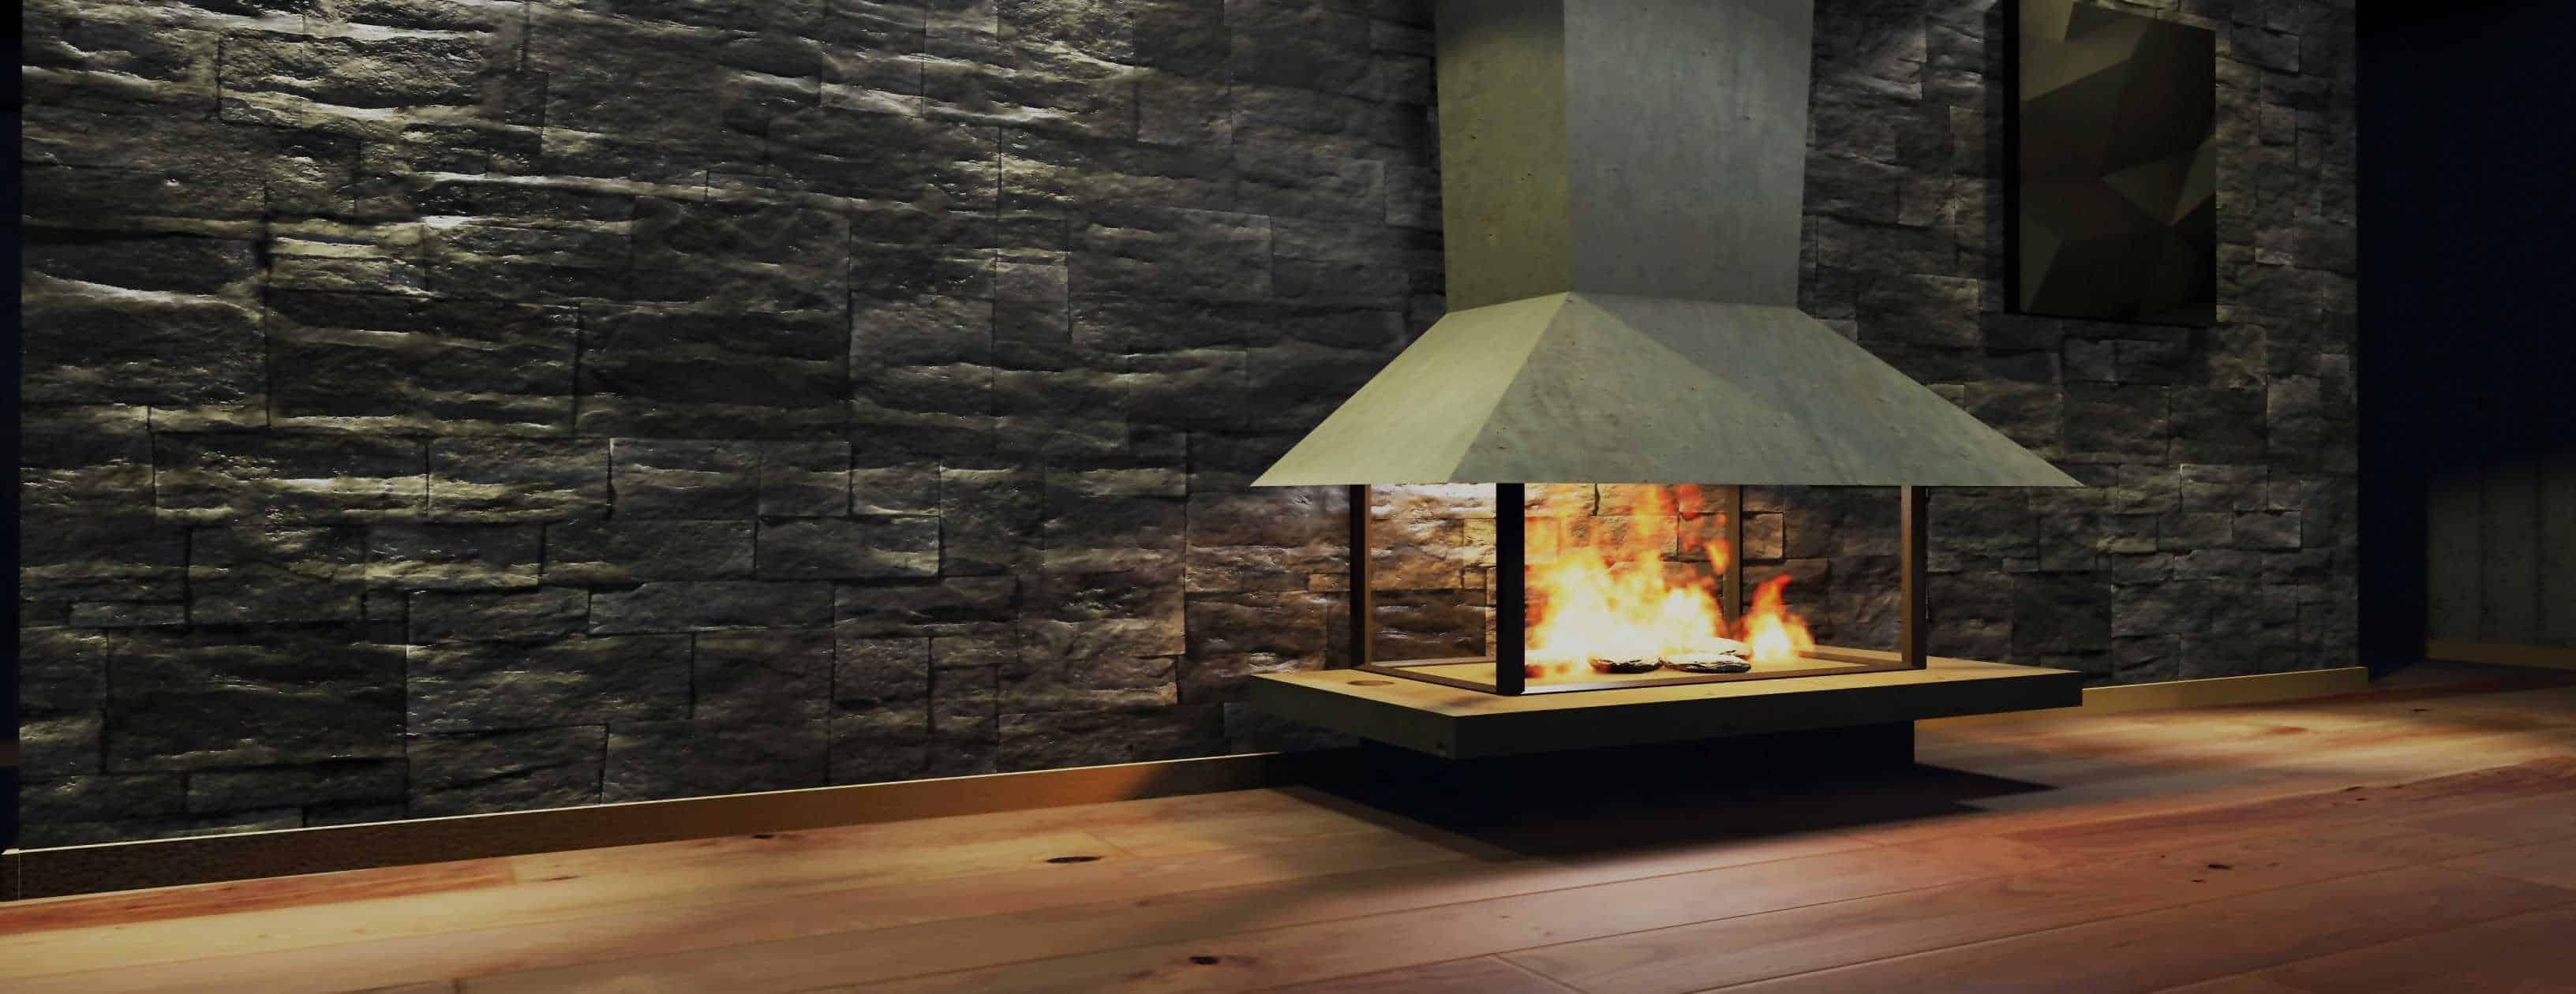 Prefab versus Masonry – Fireplace Chimney Sweep